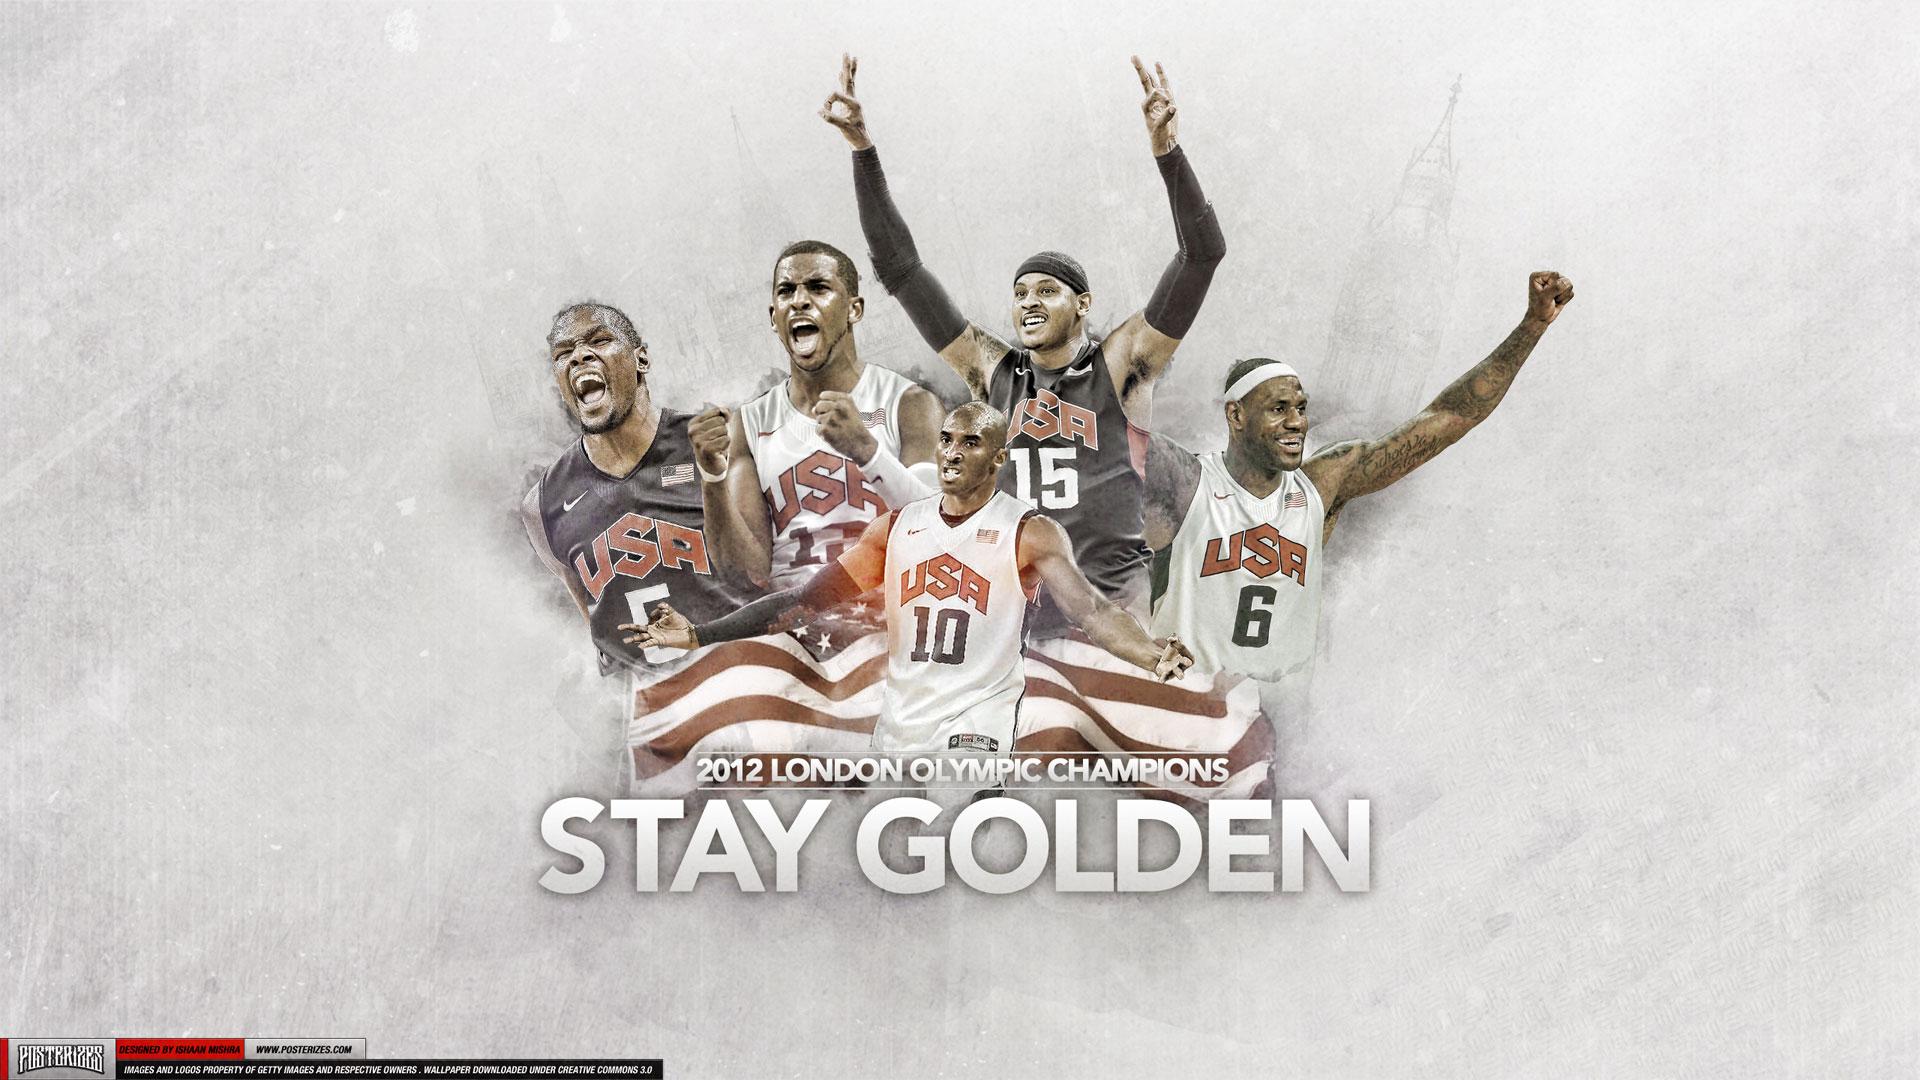 2012 Dream Team Olympics Gold 1920×1080 Wallpaper | Basketball ... Jabari Parker Lebron James